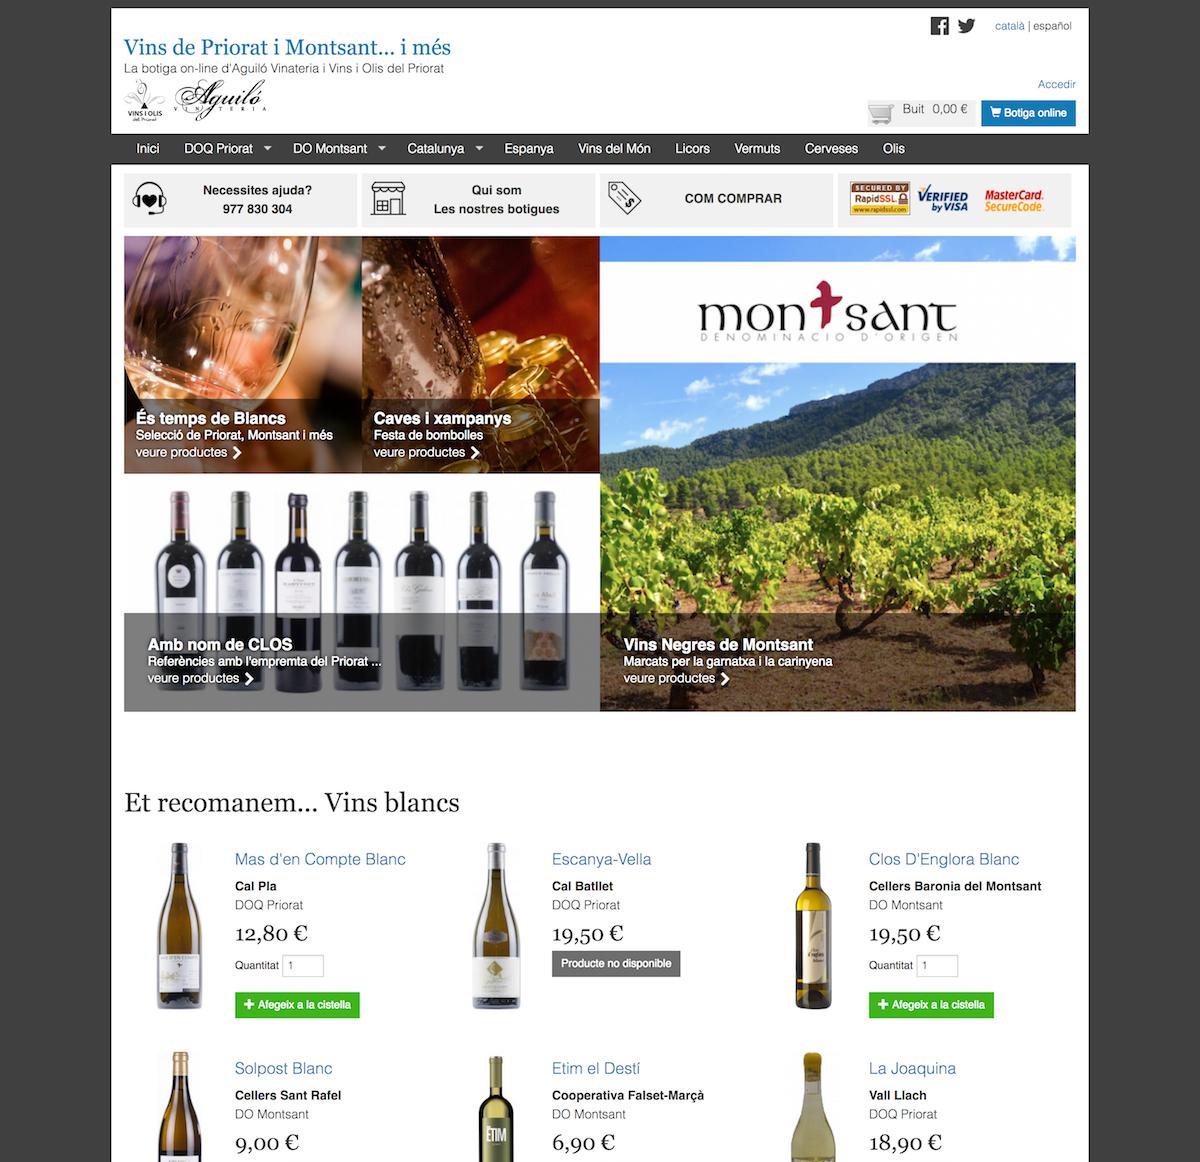 Vins Priorat i Montsant